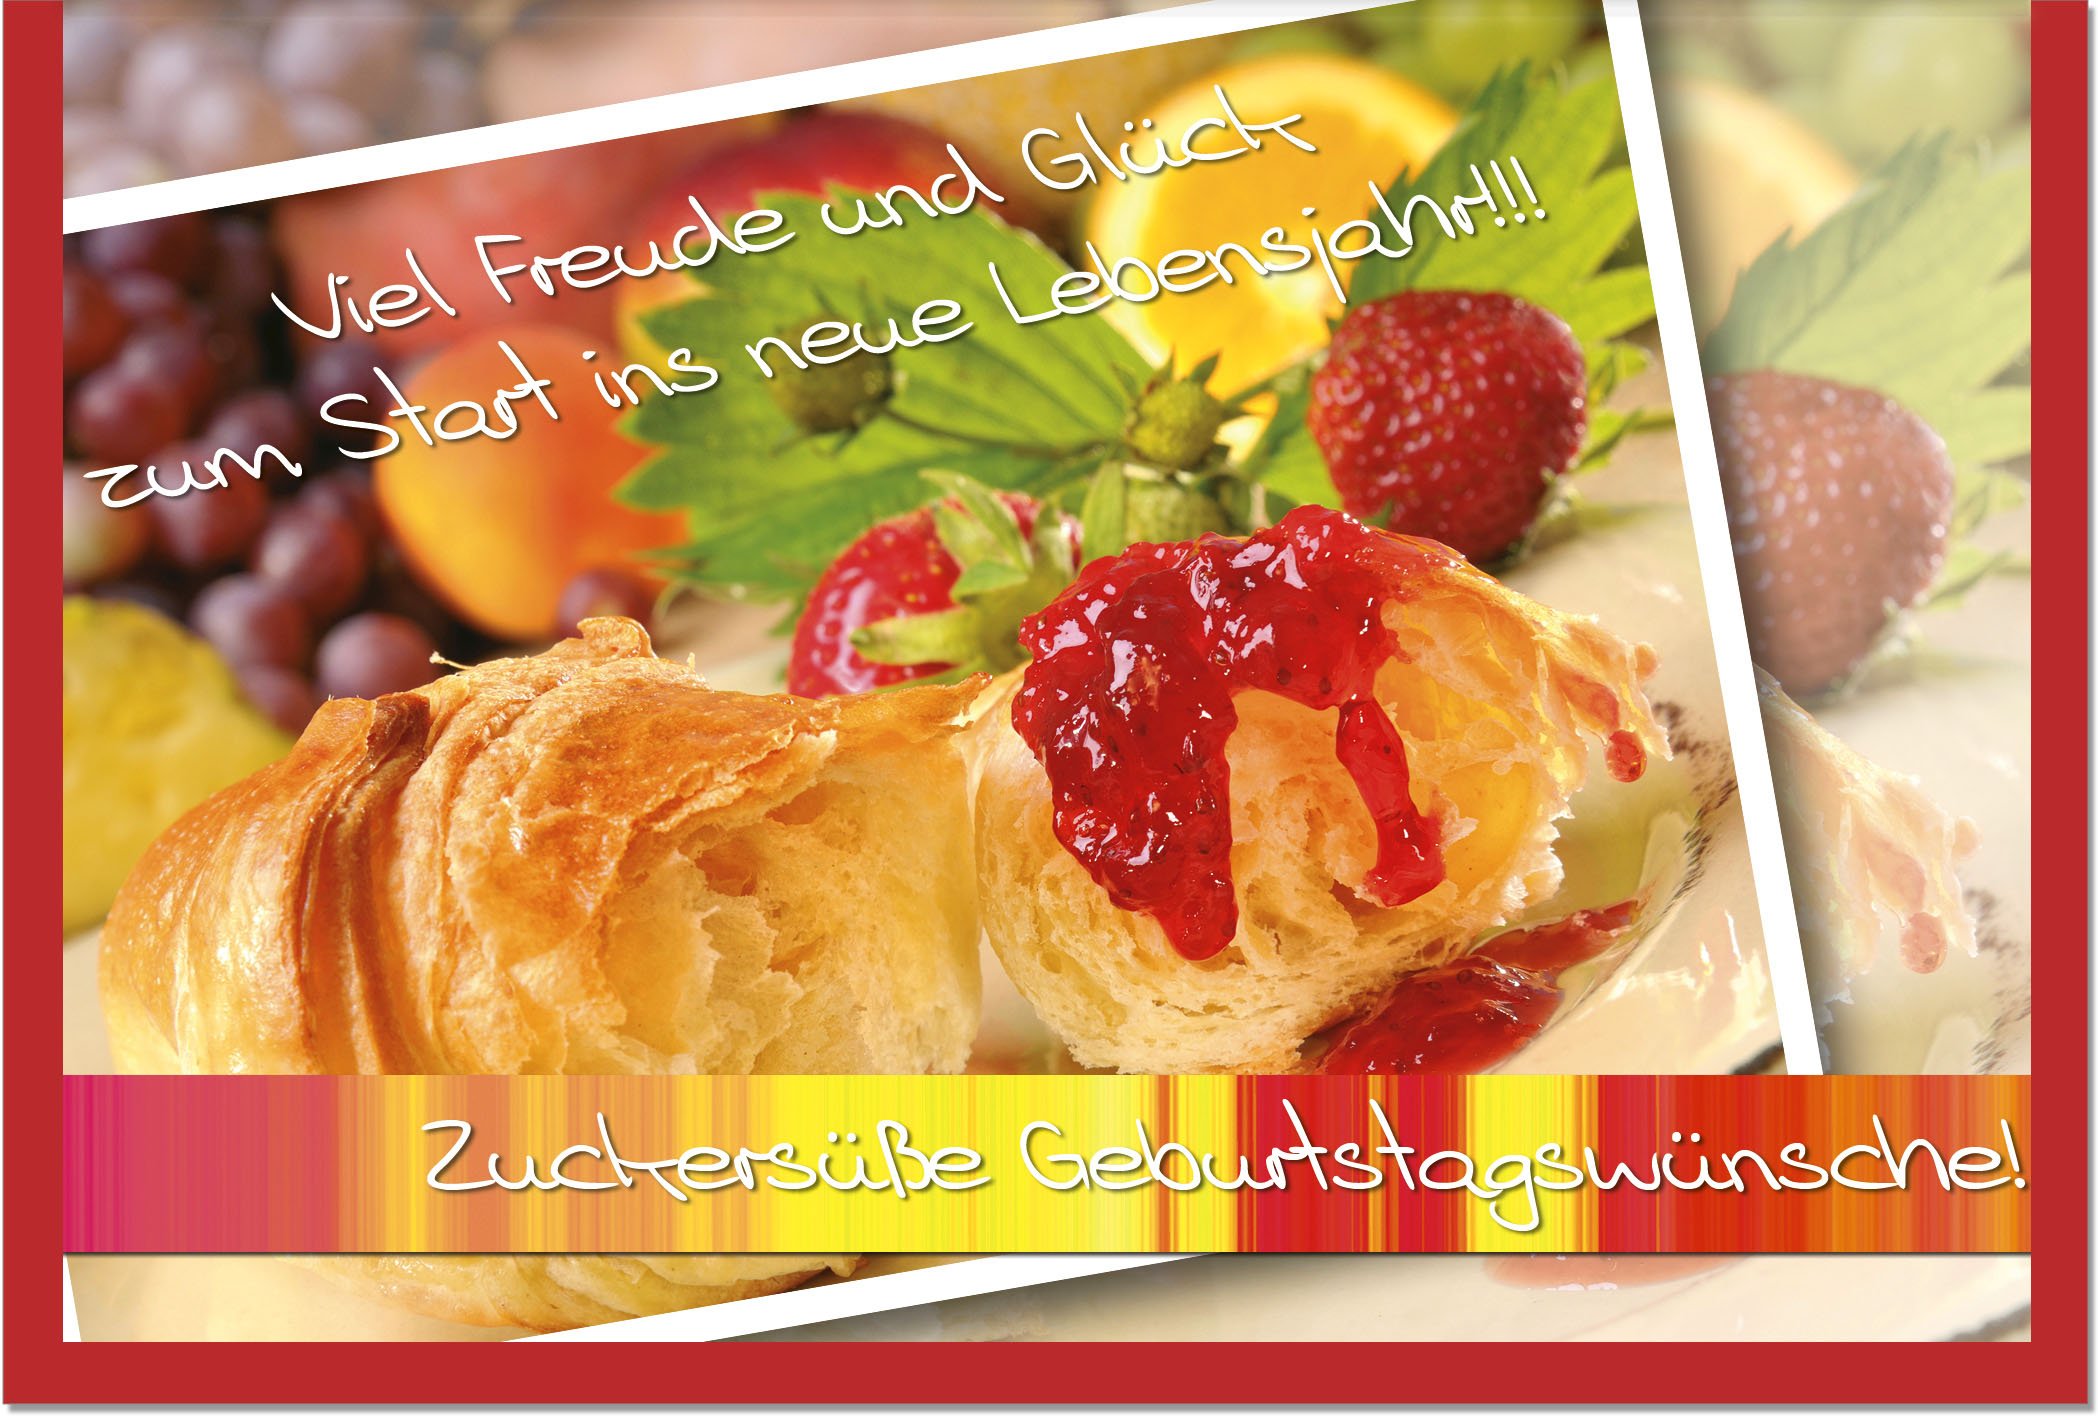 Geburtstagskarten / Grußkarten /Geburtstag Croissant